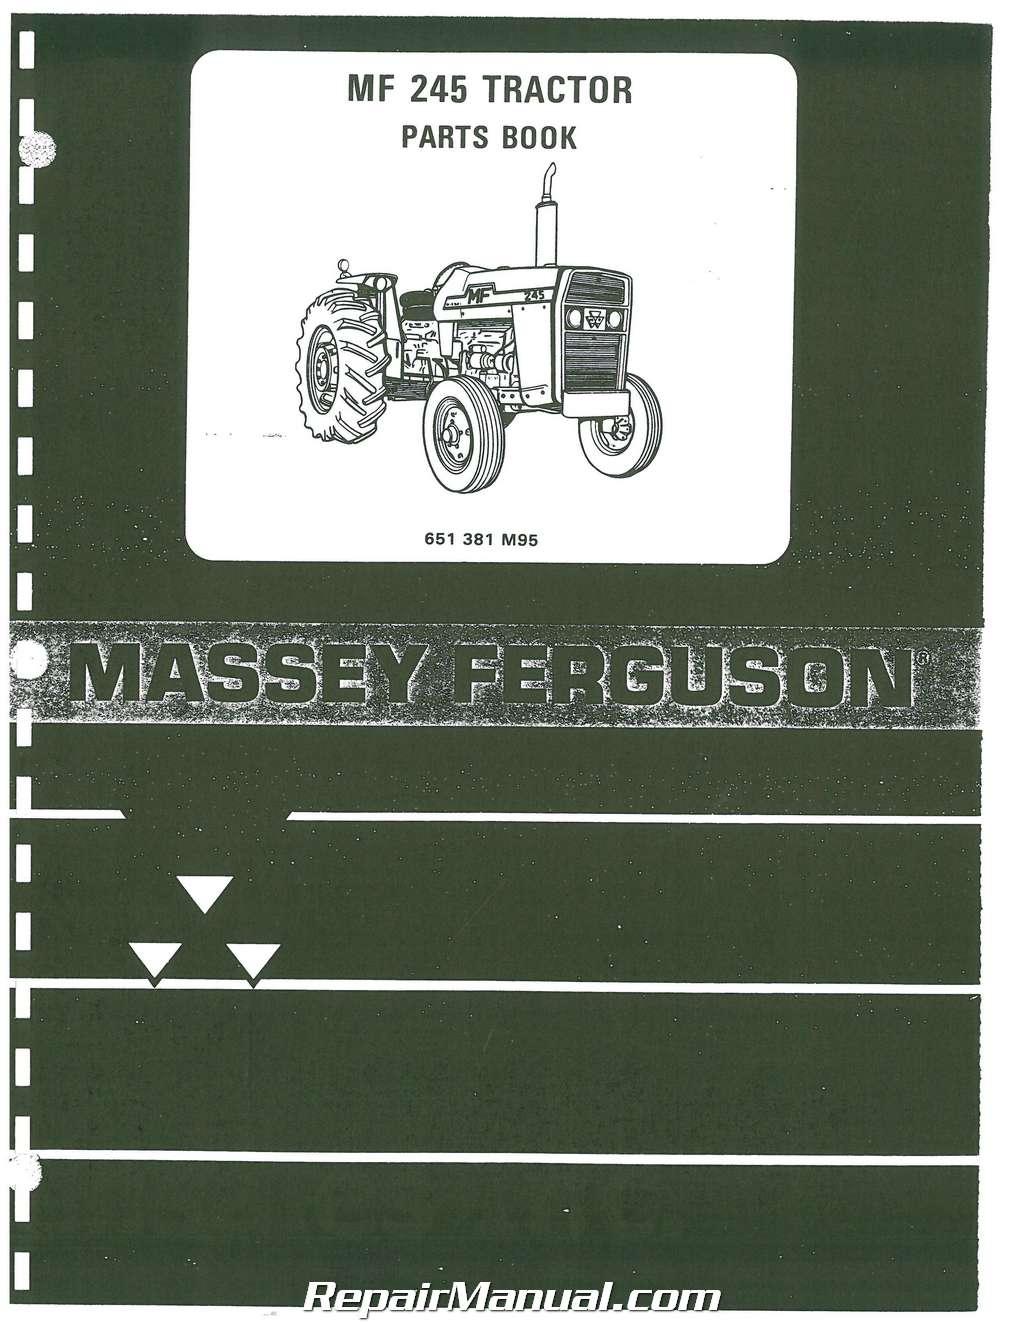 Doc on Massey Ferguson Parts Catalog